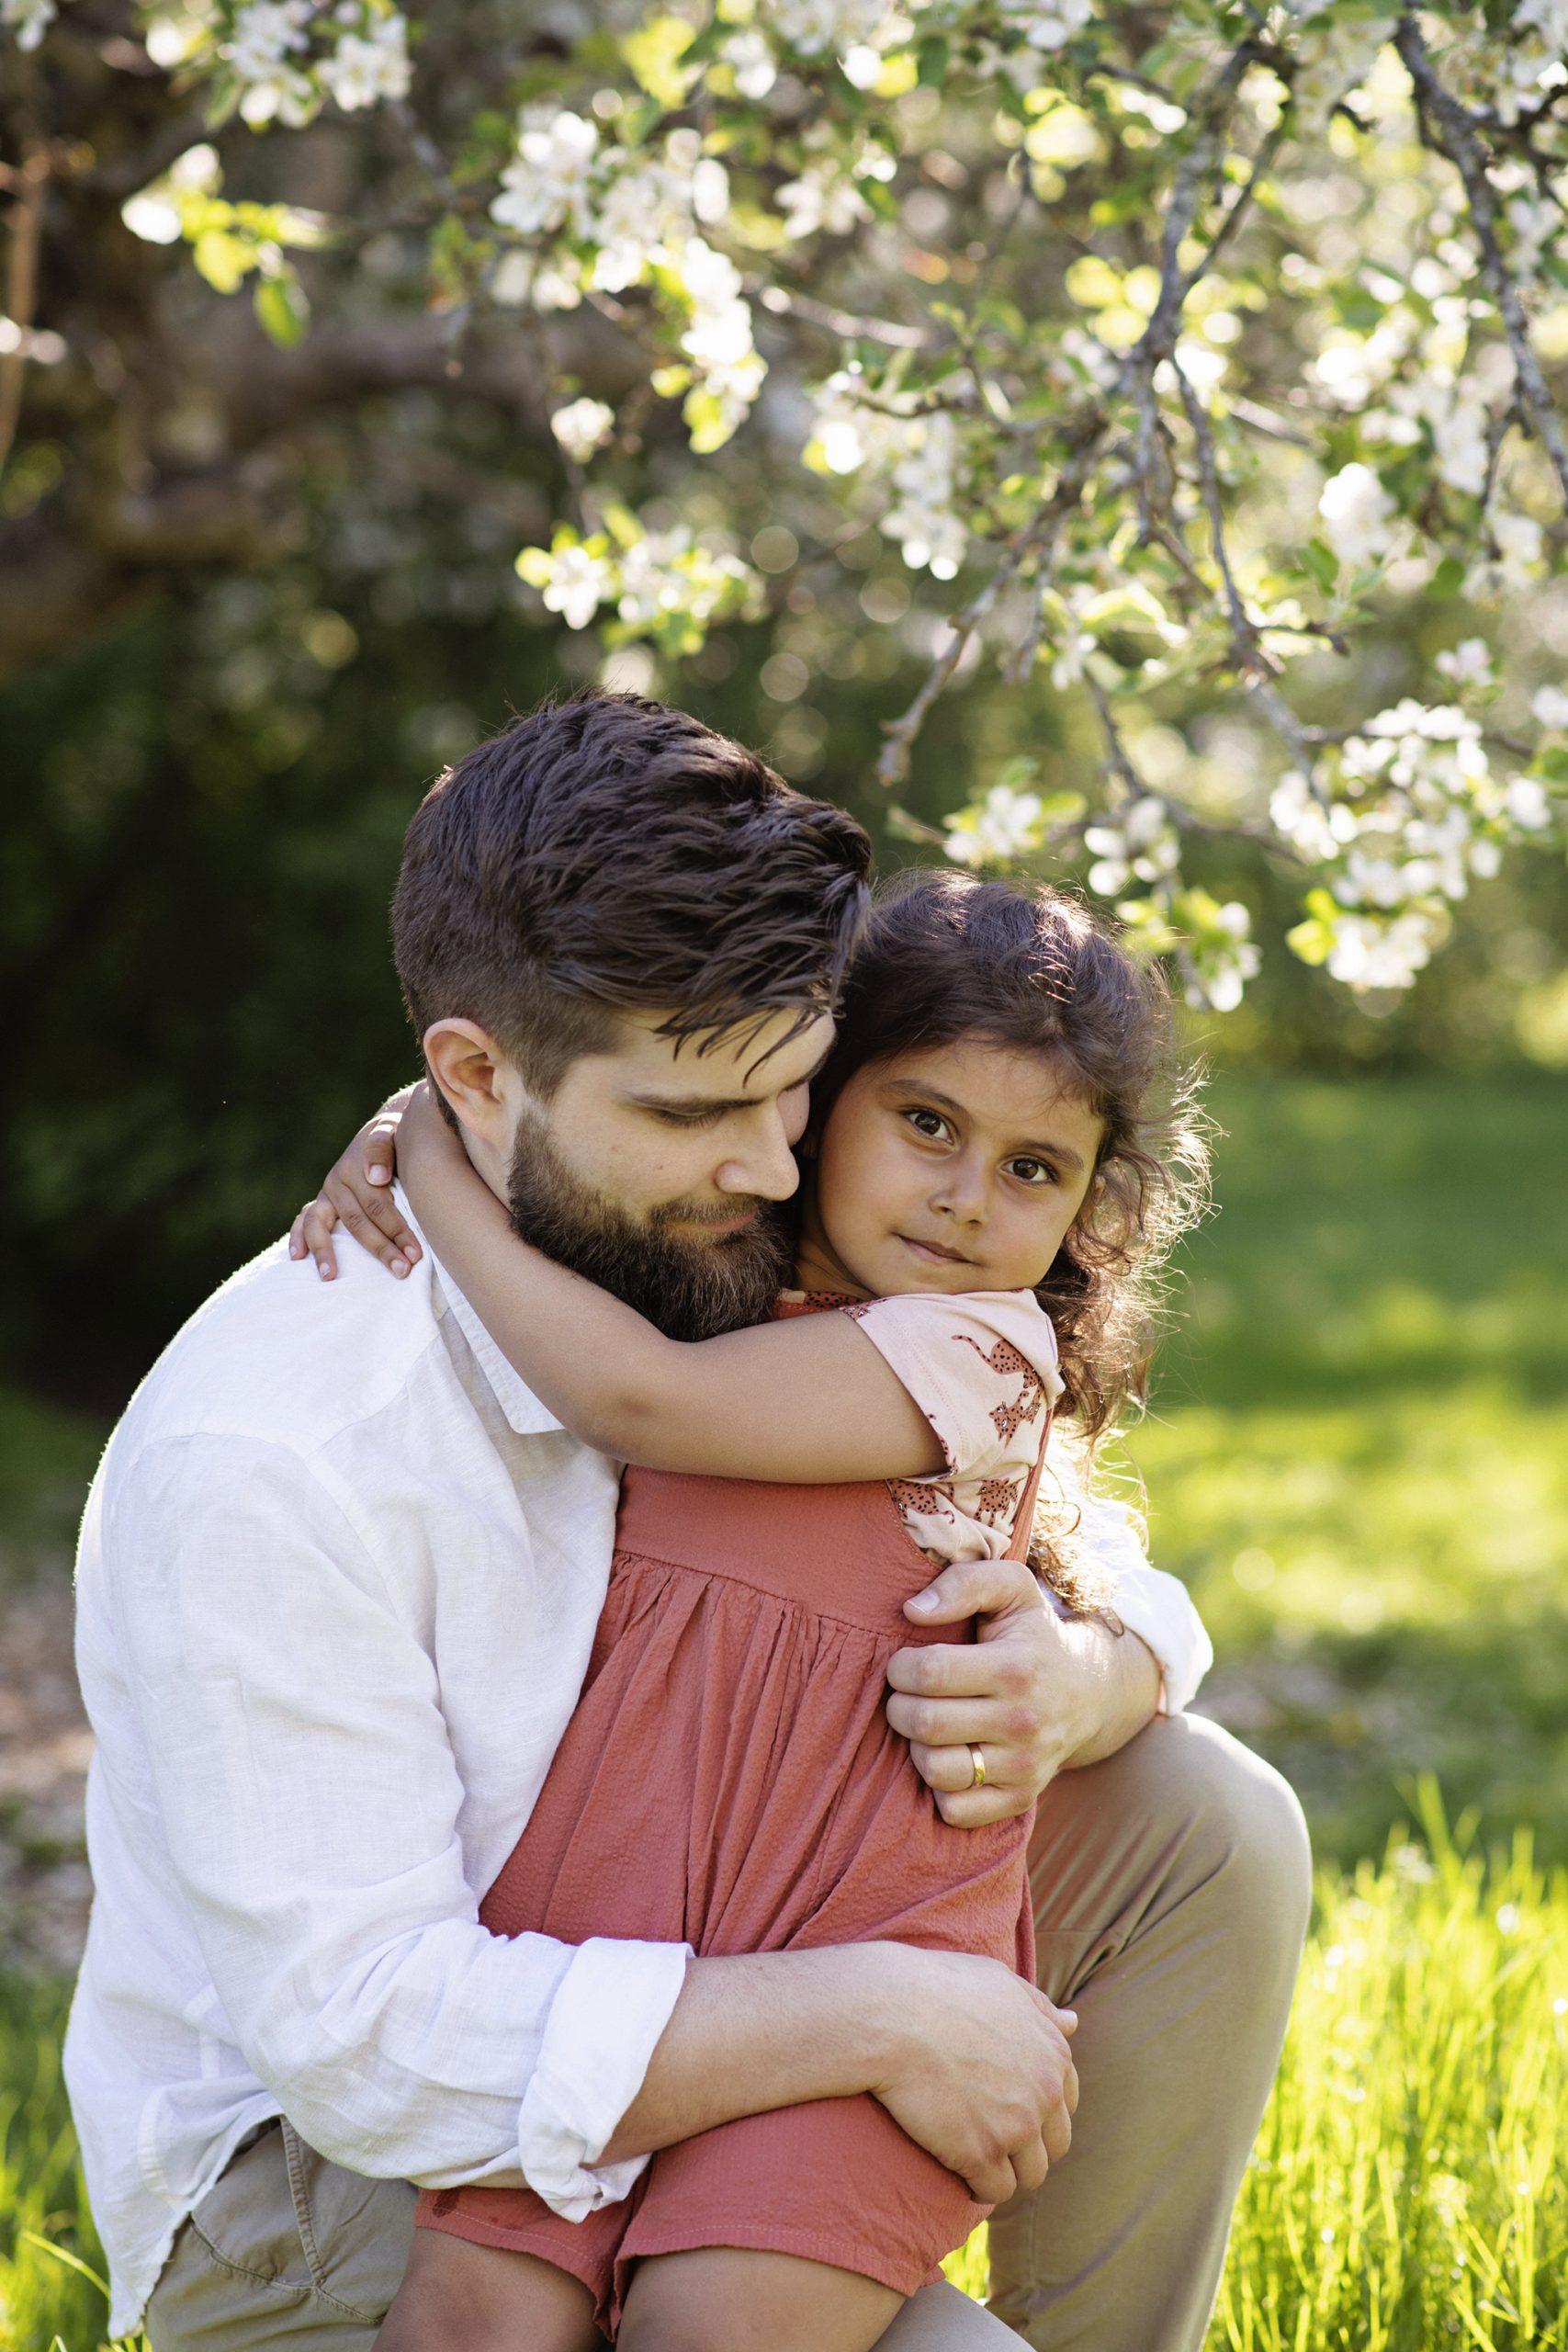 barn-/familjefotograf uppsala